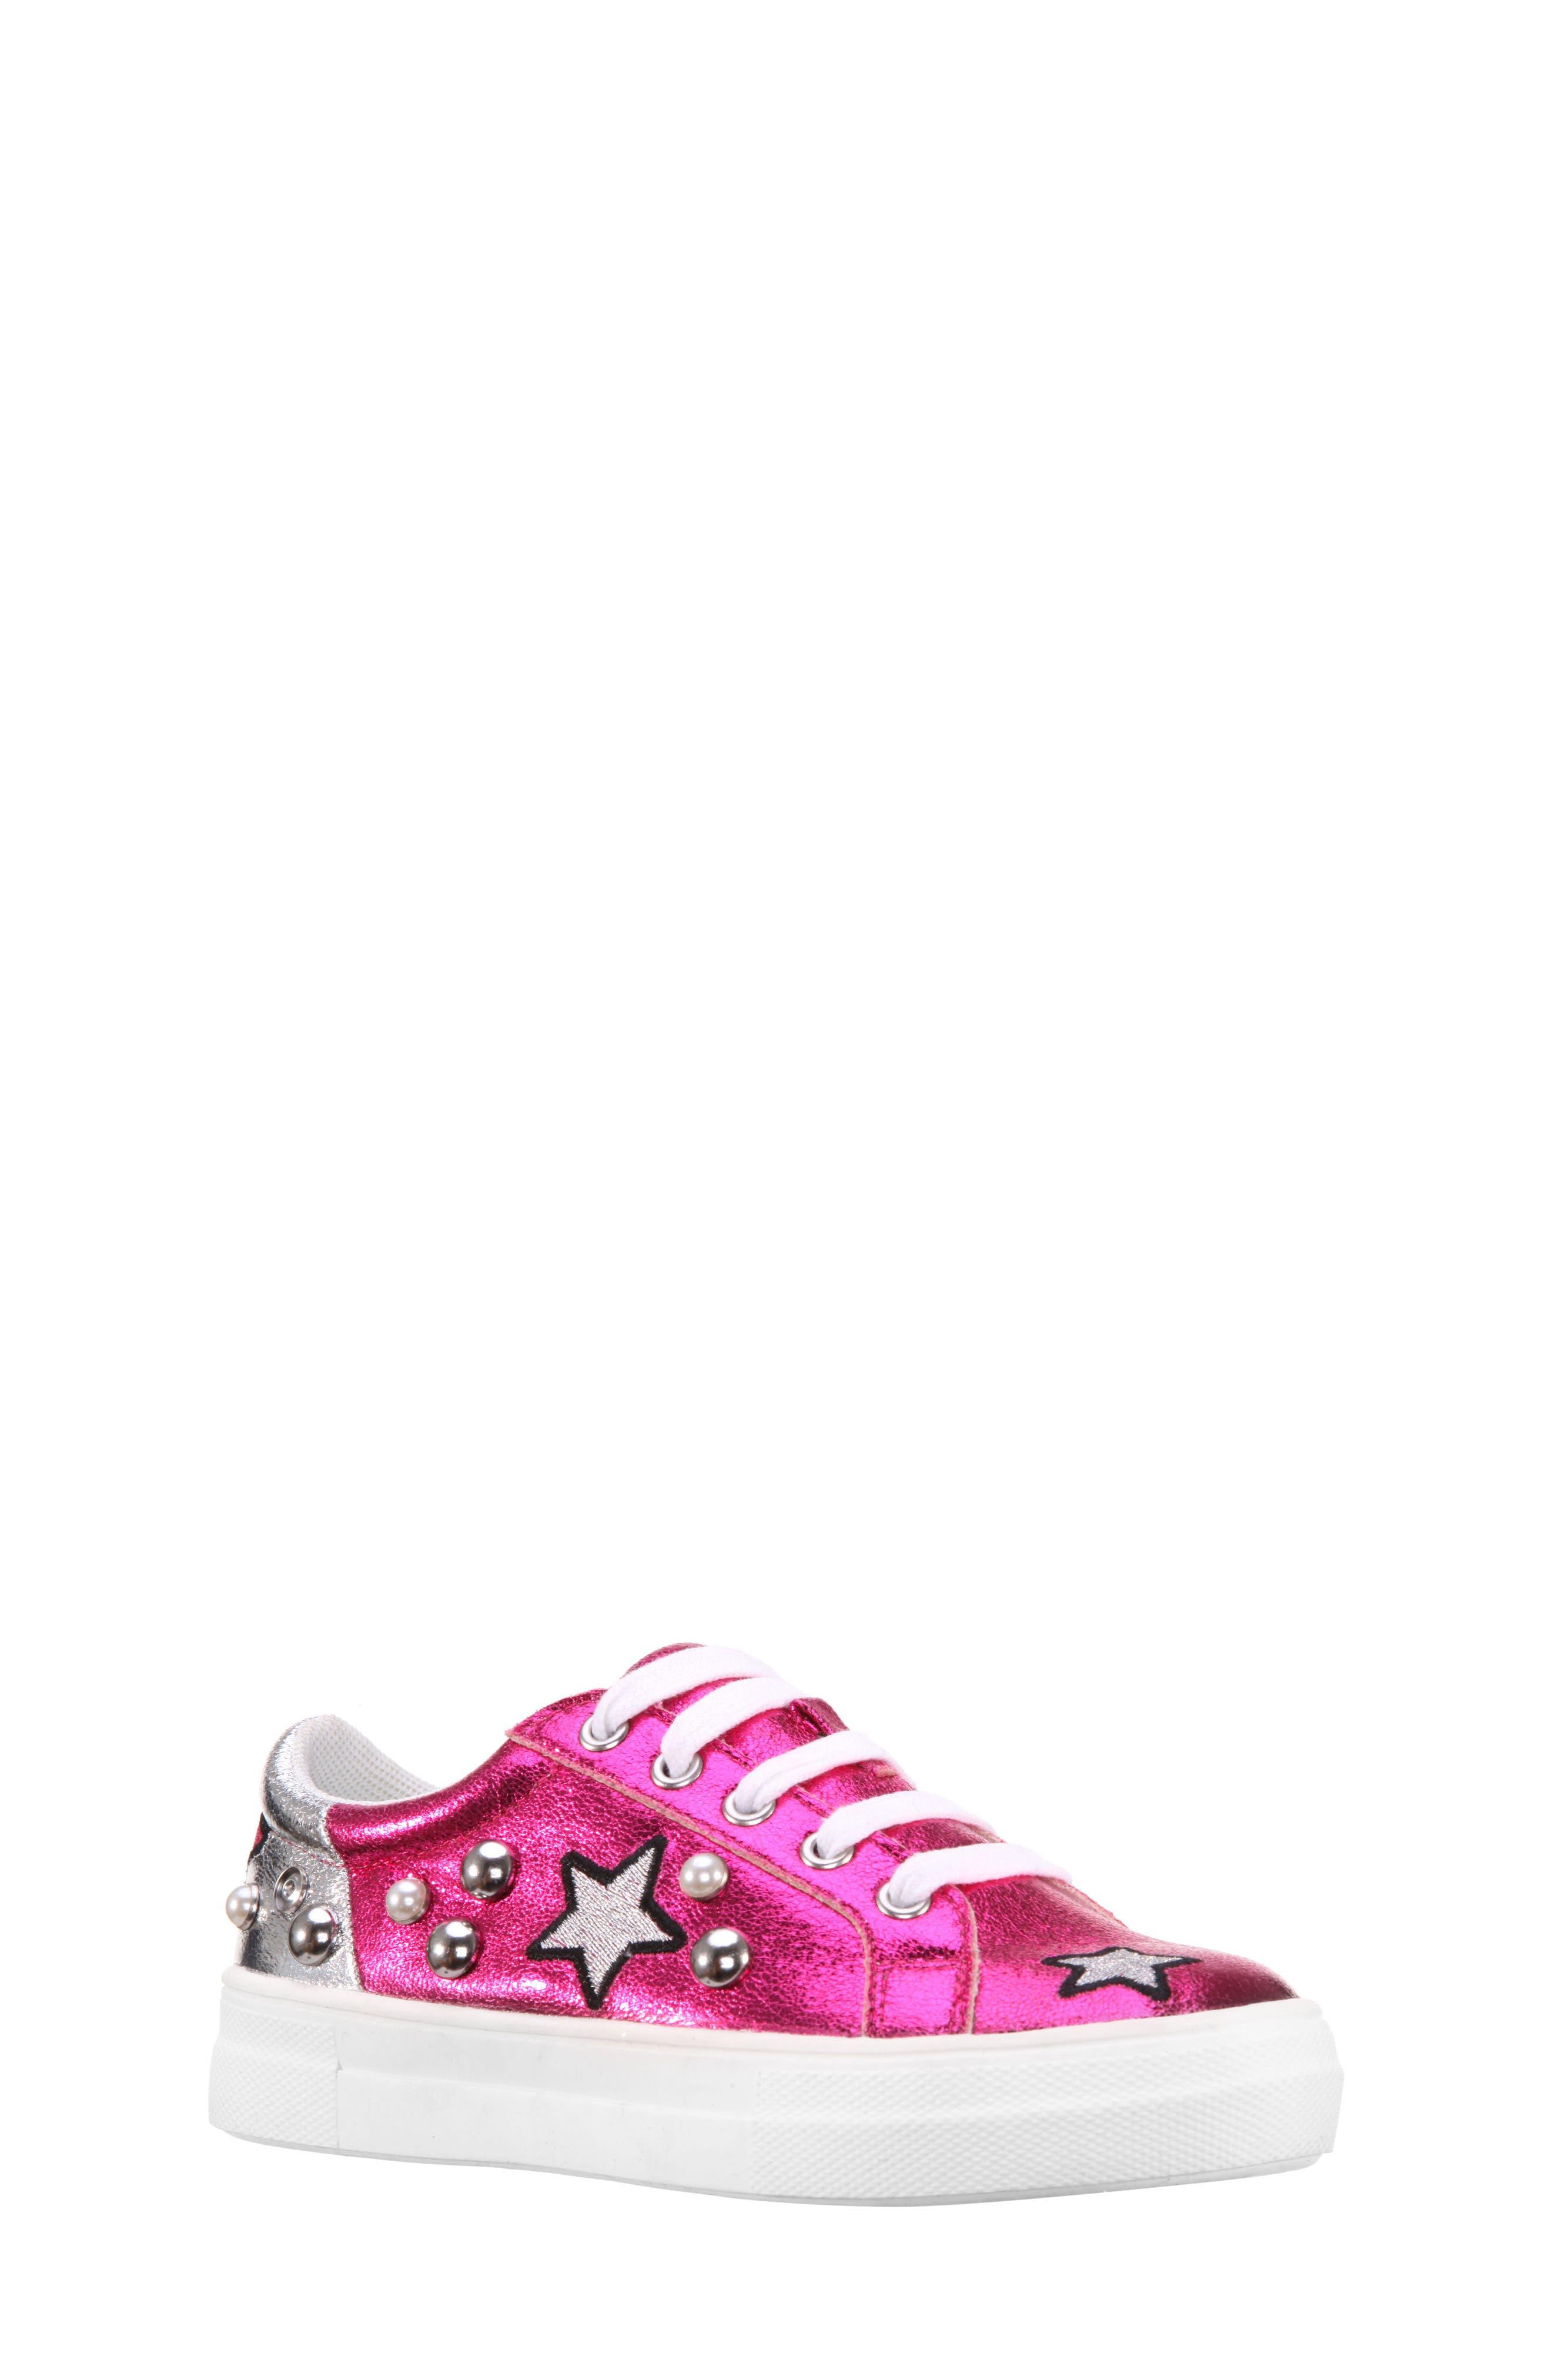 Kryslyn Metallic Sneaker,                             Main thumbnail 1, color,                             694